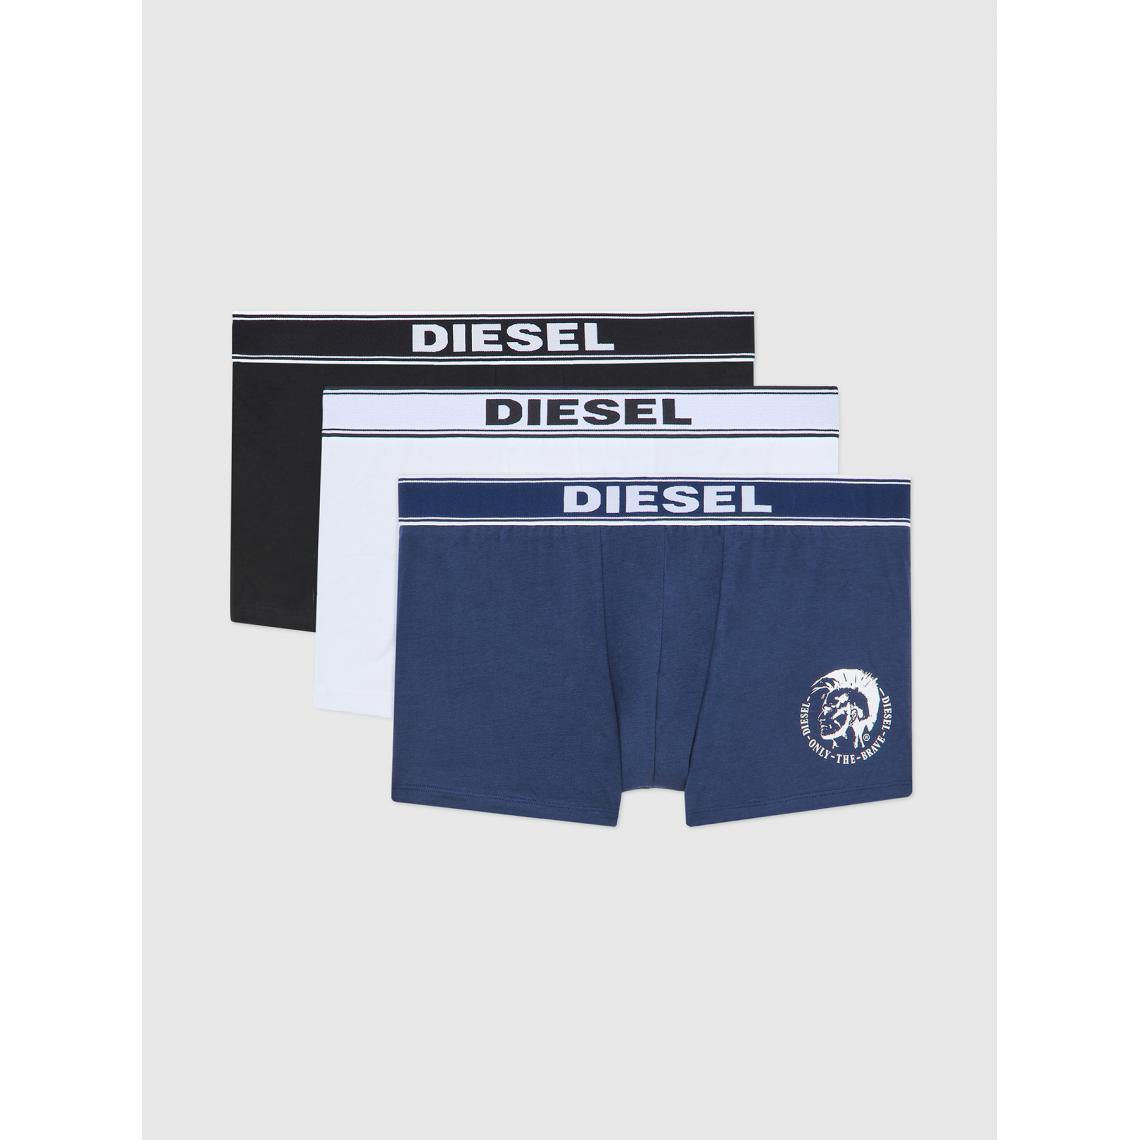 Pack de 3 boxers logotes ceinture elastique - / Blanc / Noir - Diesel Underwear - Modalova